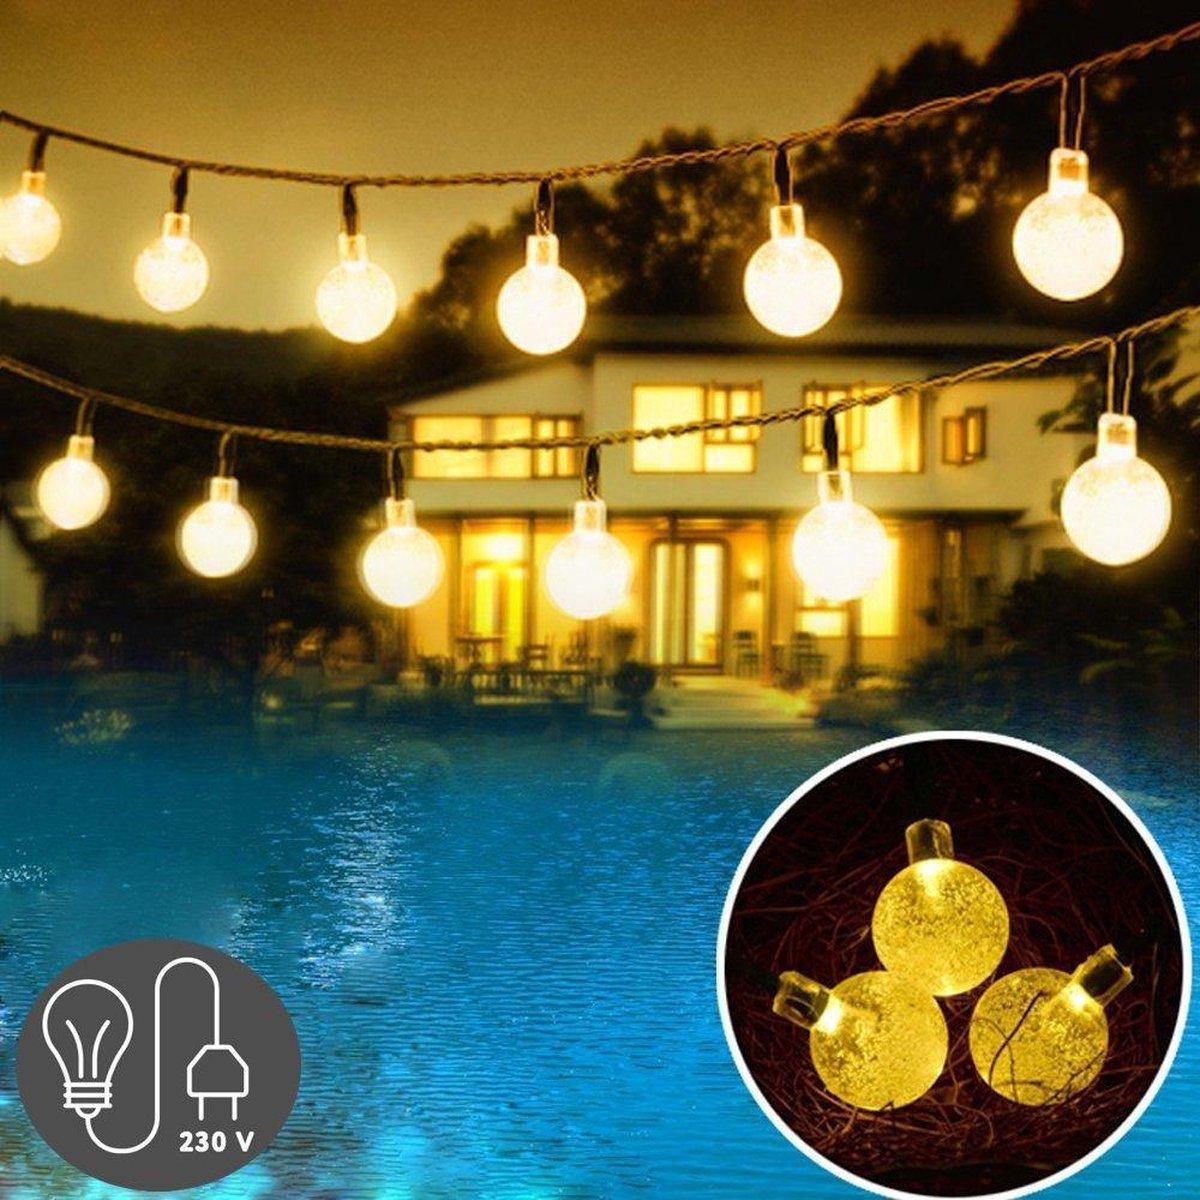 J-Pro Tuinverlichting - 100 Cristal Warm LED 17m - Lichtsnoer - Buiten Lichtslinger - Met Stekker